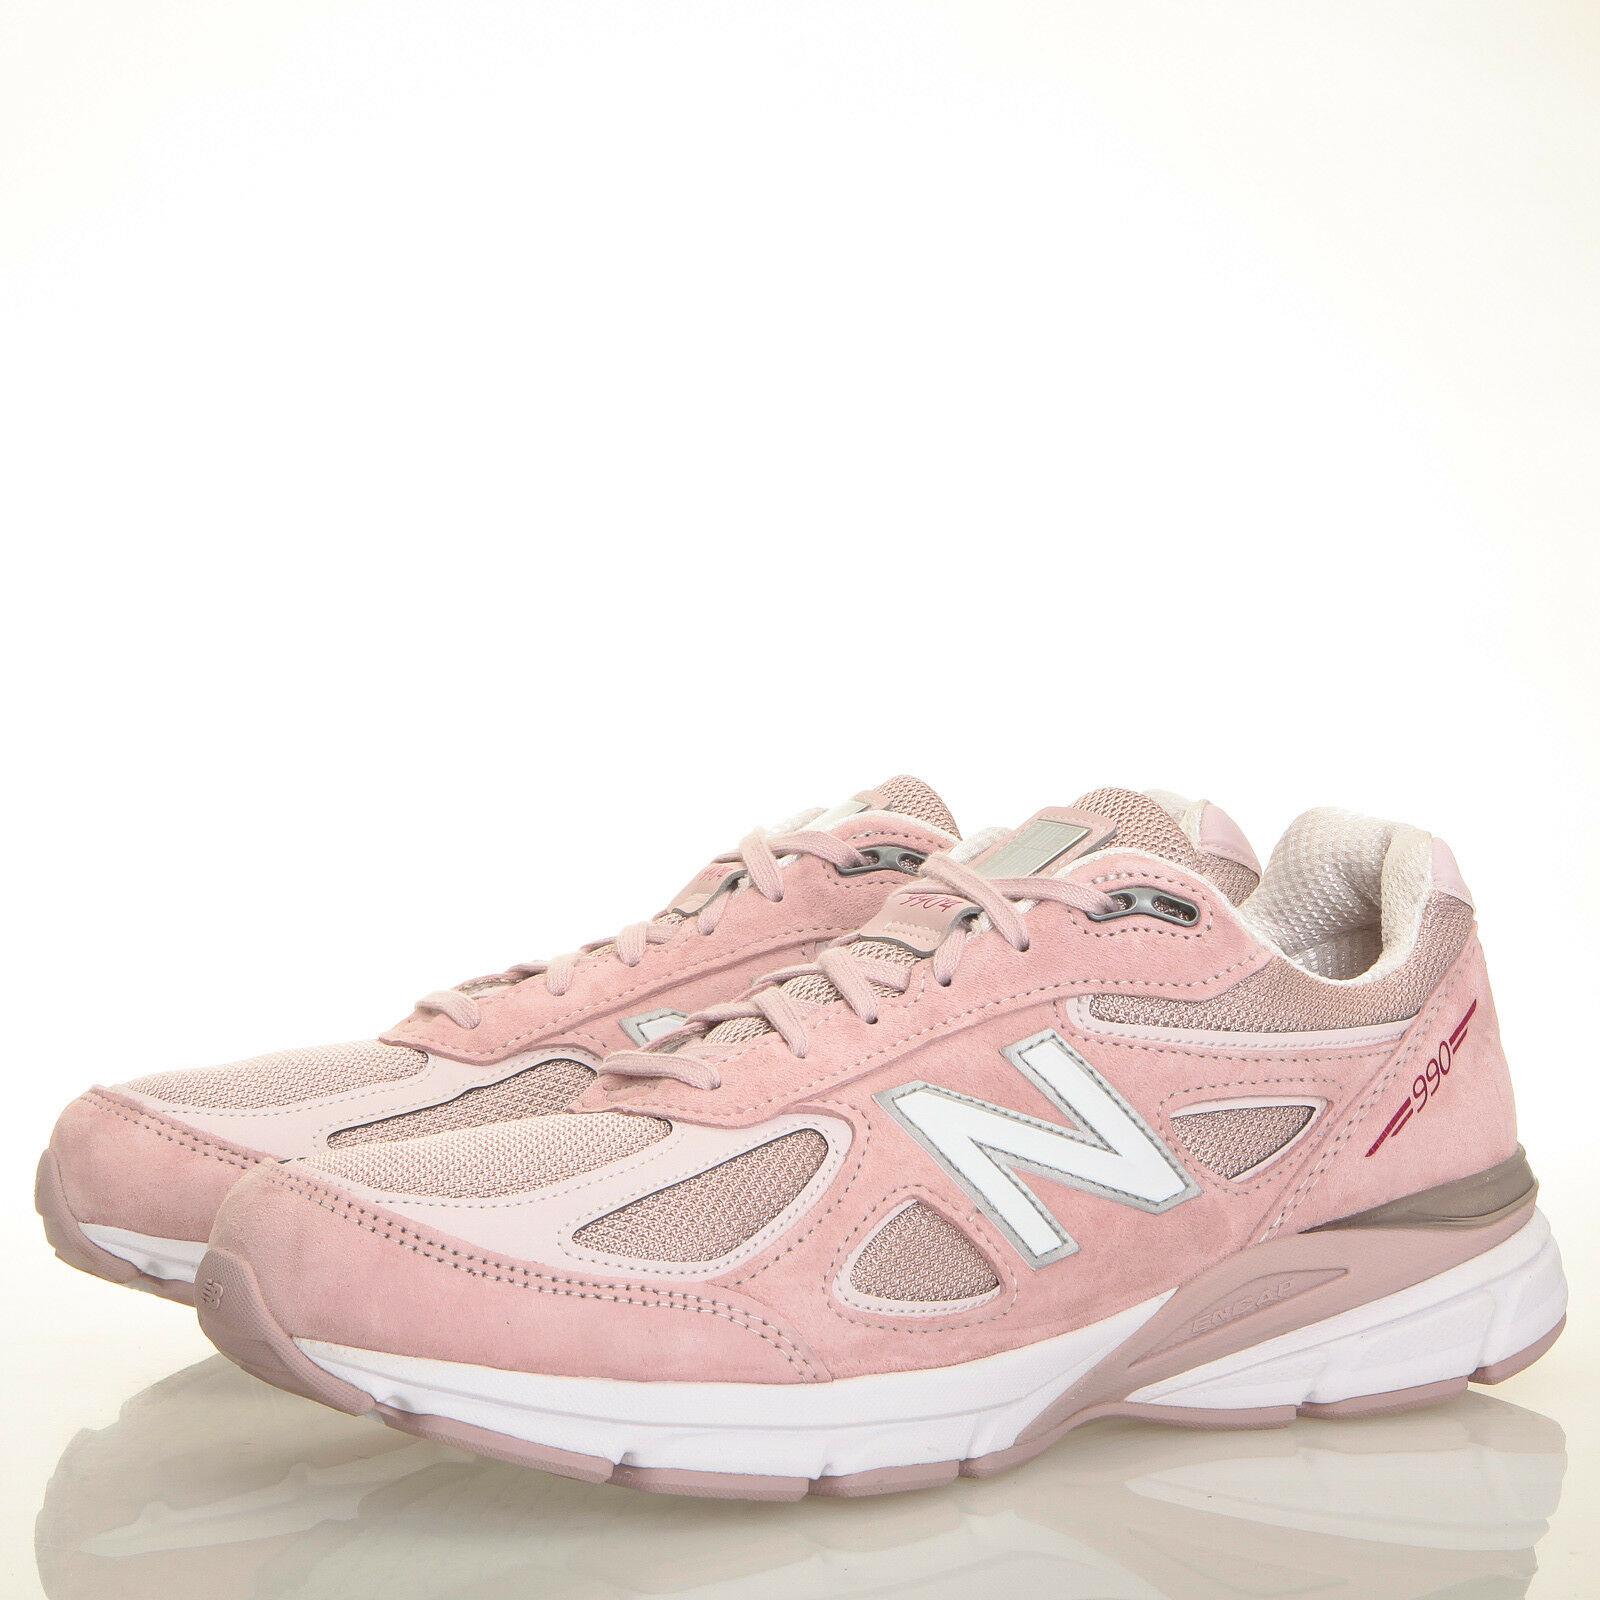 New Balance 990v4 Pink Ribbon Faded Rose